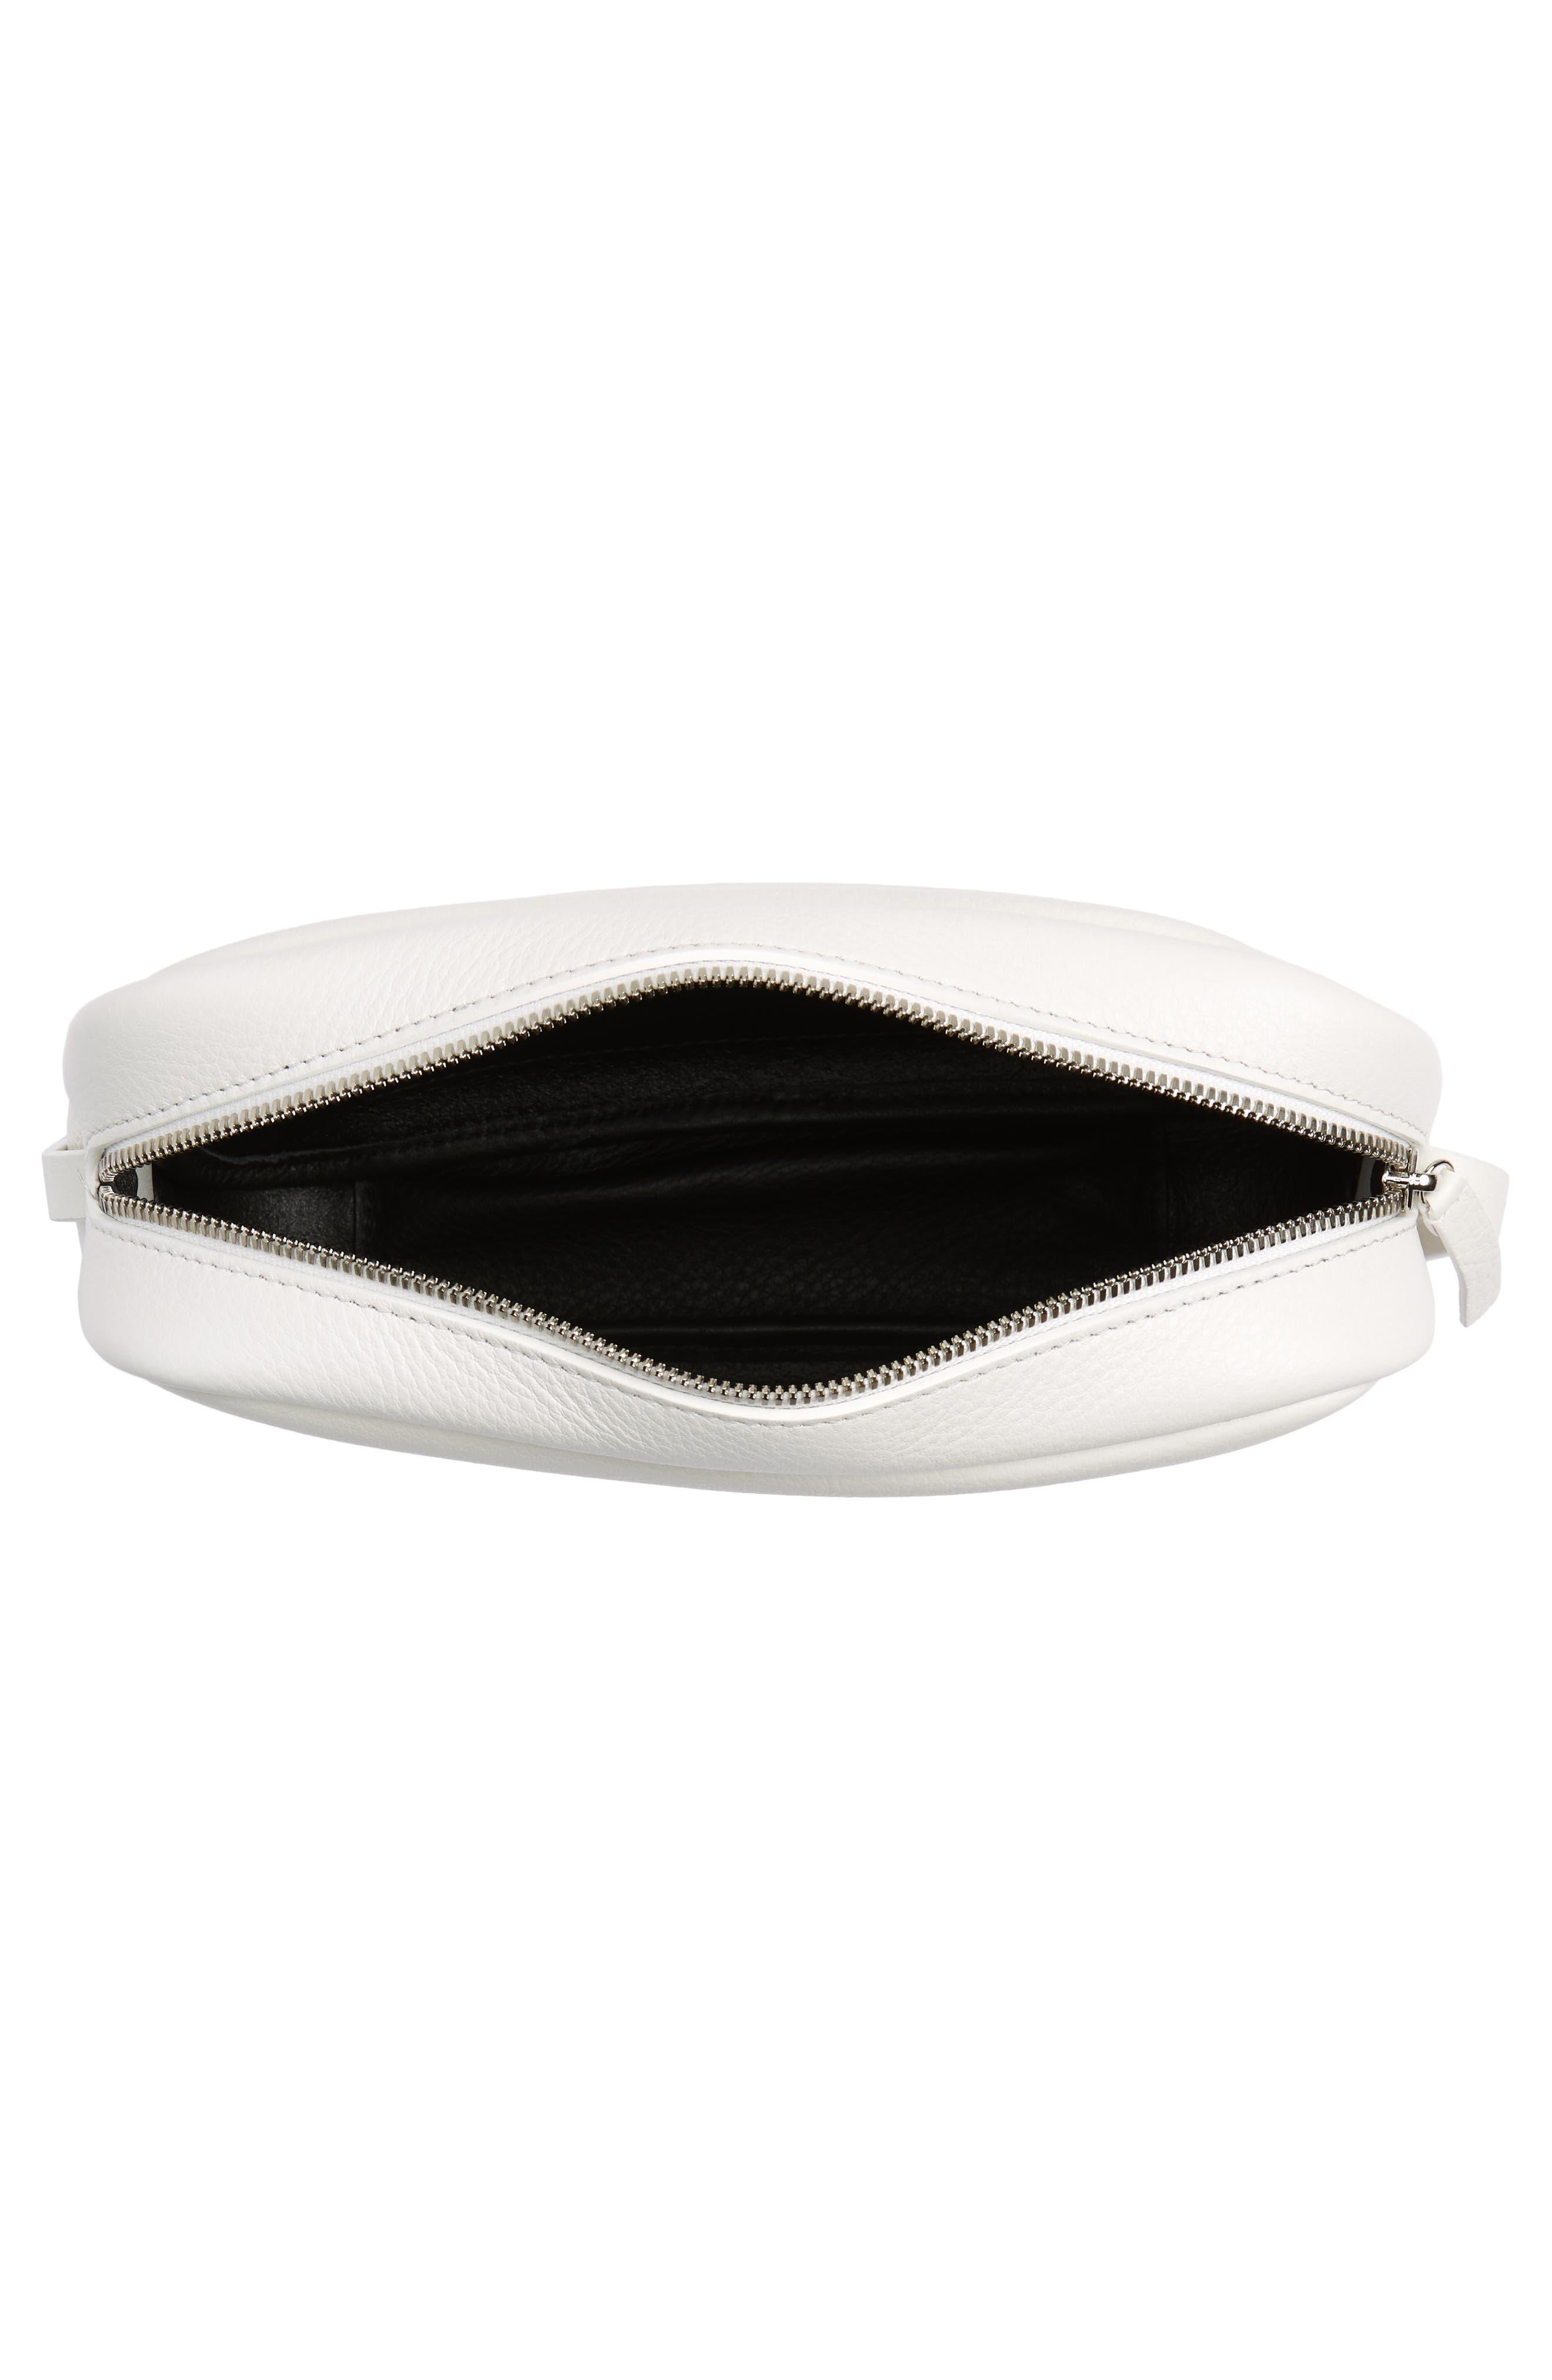 Small Everyday Calfskin Leather Camera Bag,                             Alternate thumbnail 4, color,                             BLANC OPTIQUE/ NOIR